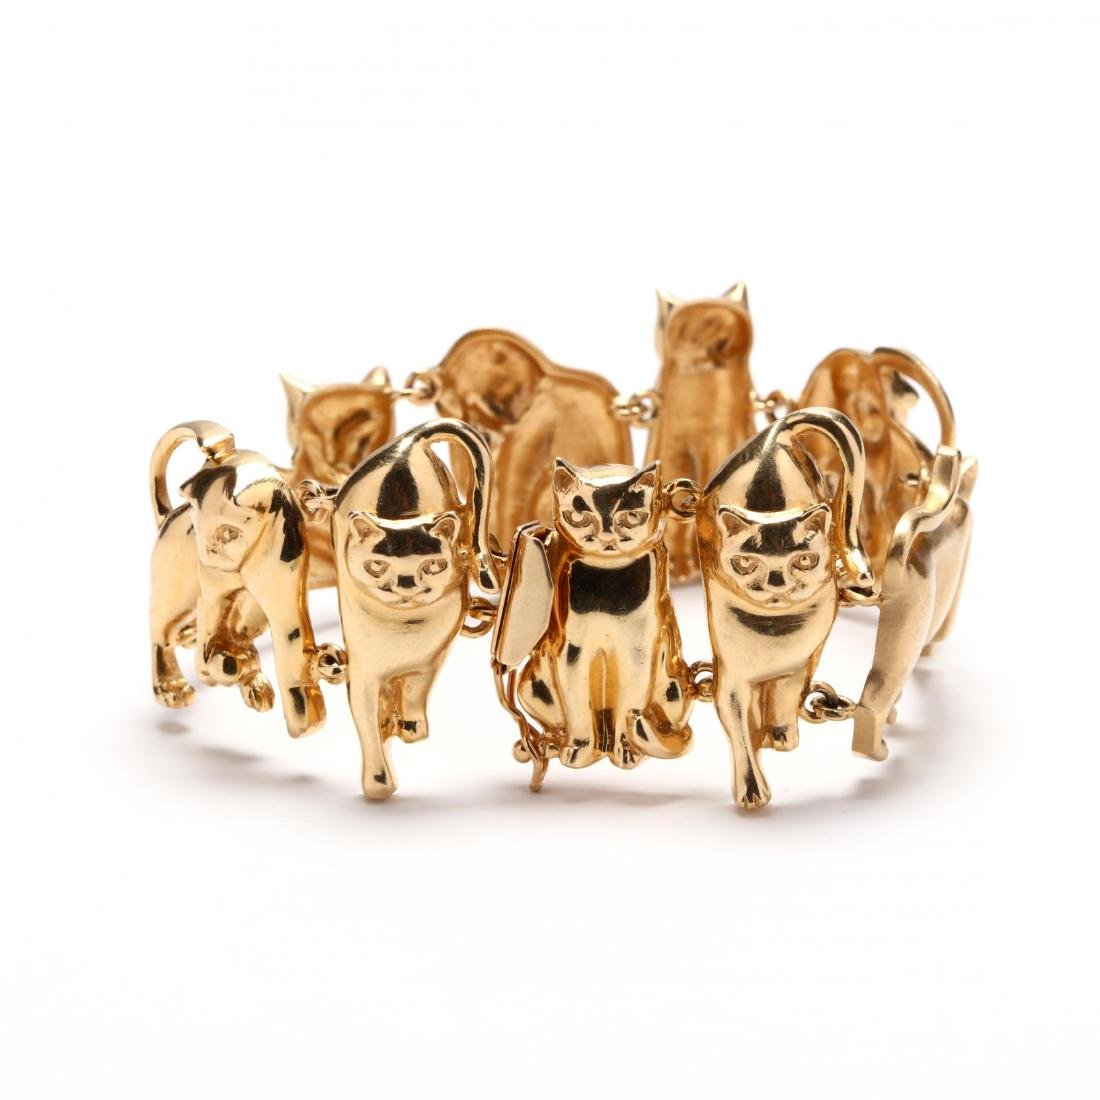 14KT Gold Feline Motif Bracelet, Ardian - 2